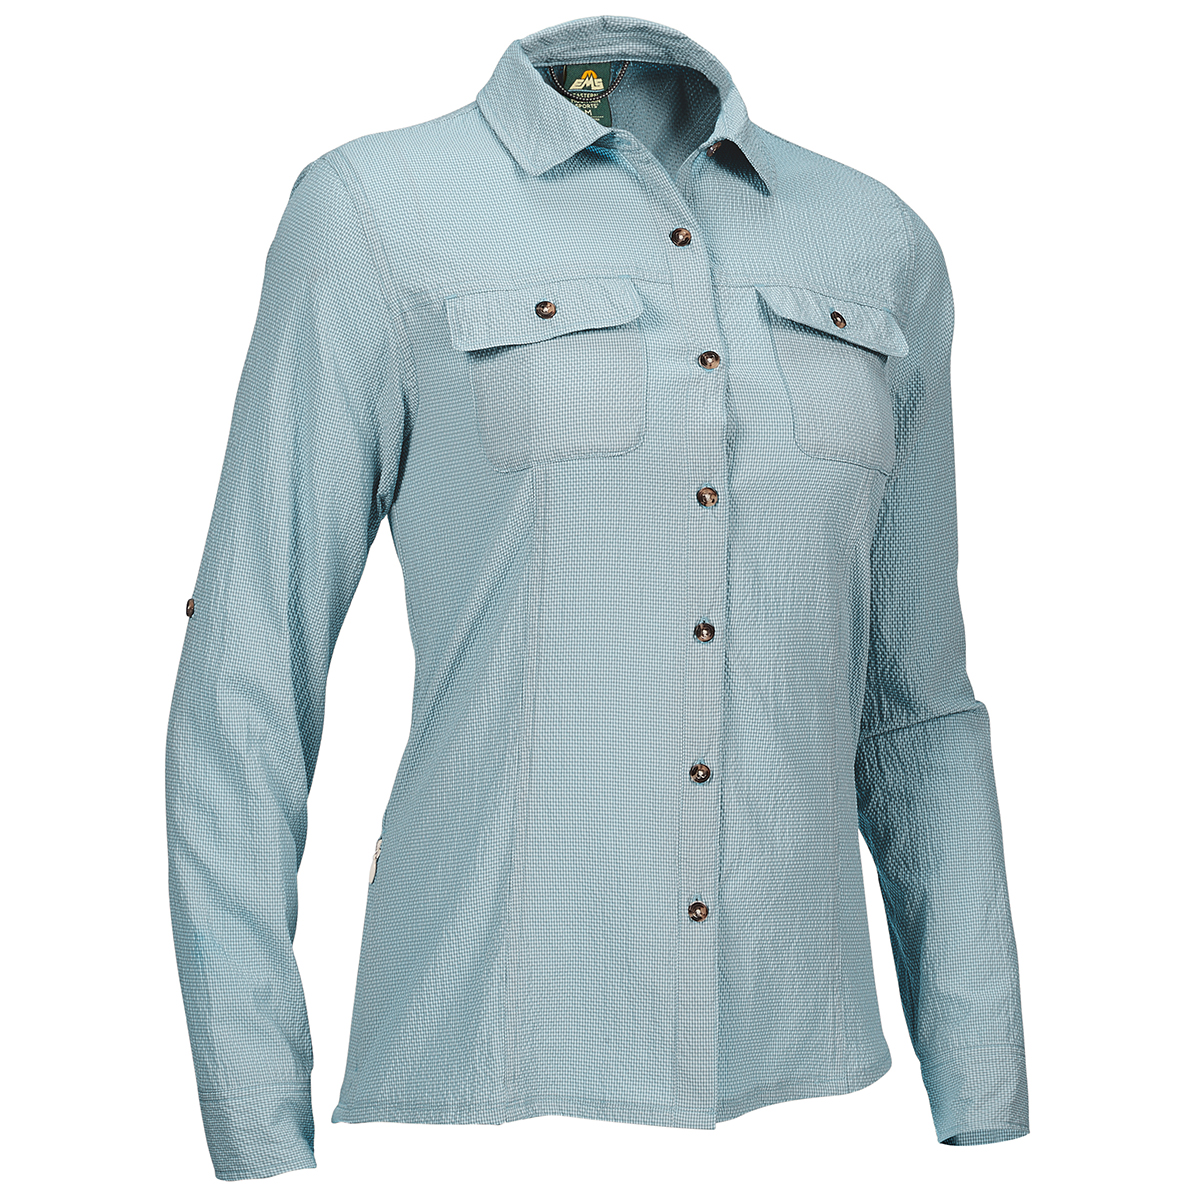 Ems Women's Bonus Miles Long-Sleeve Shirt - Blue, XS